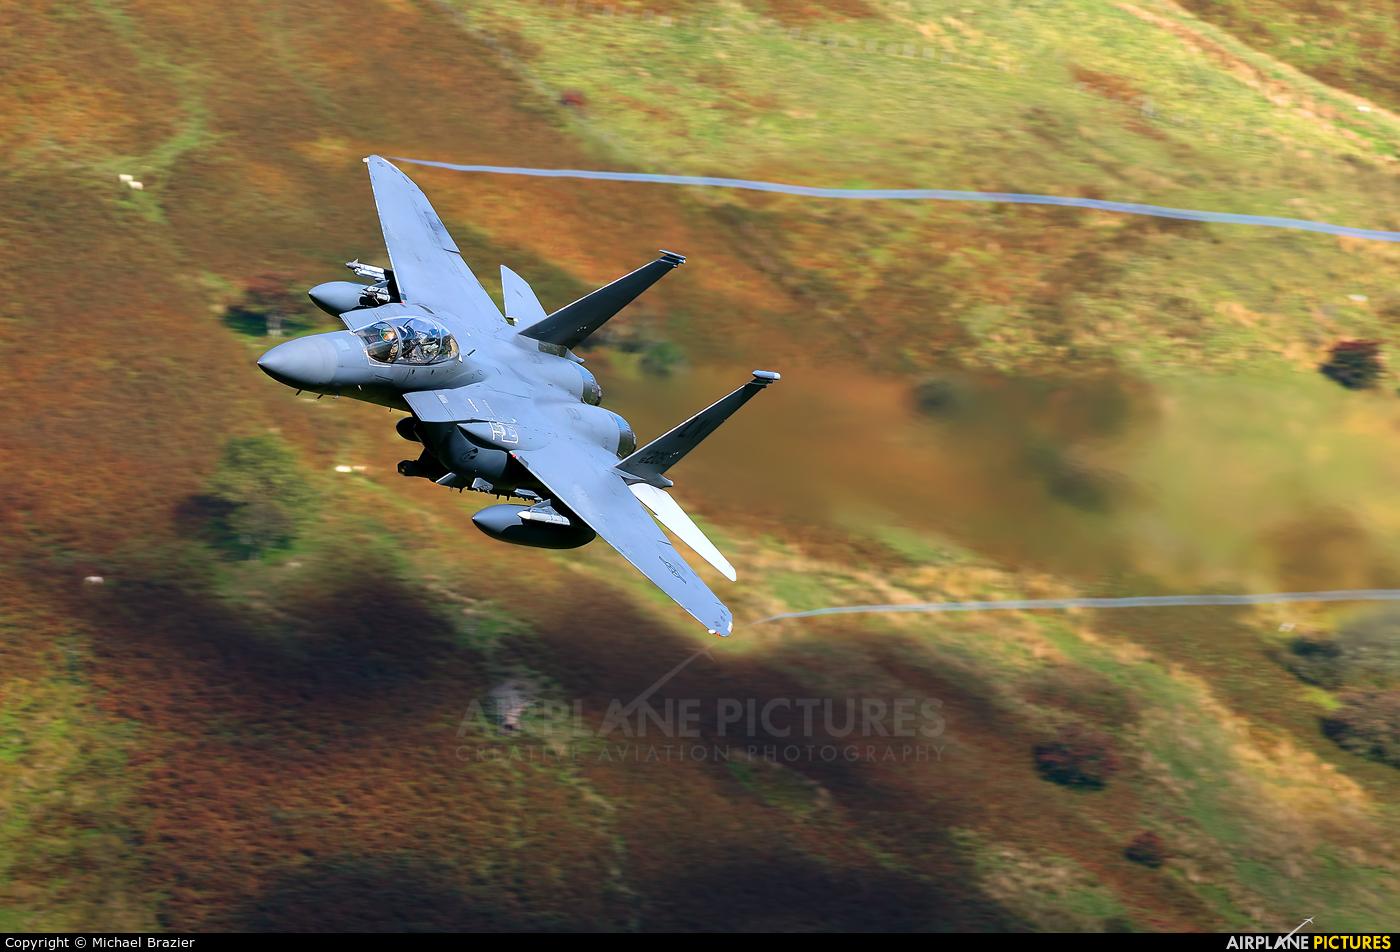 USA - Air Force 96-0205 aircraft at Machynlleth Loop - LFA 7